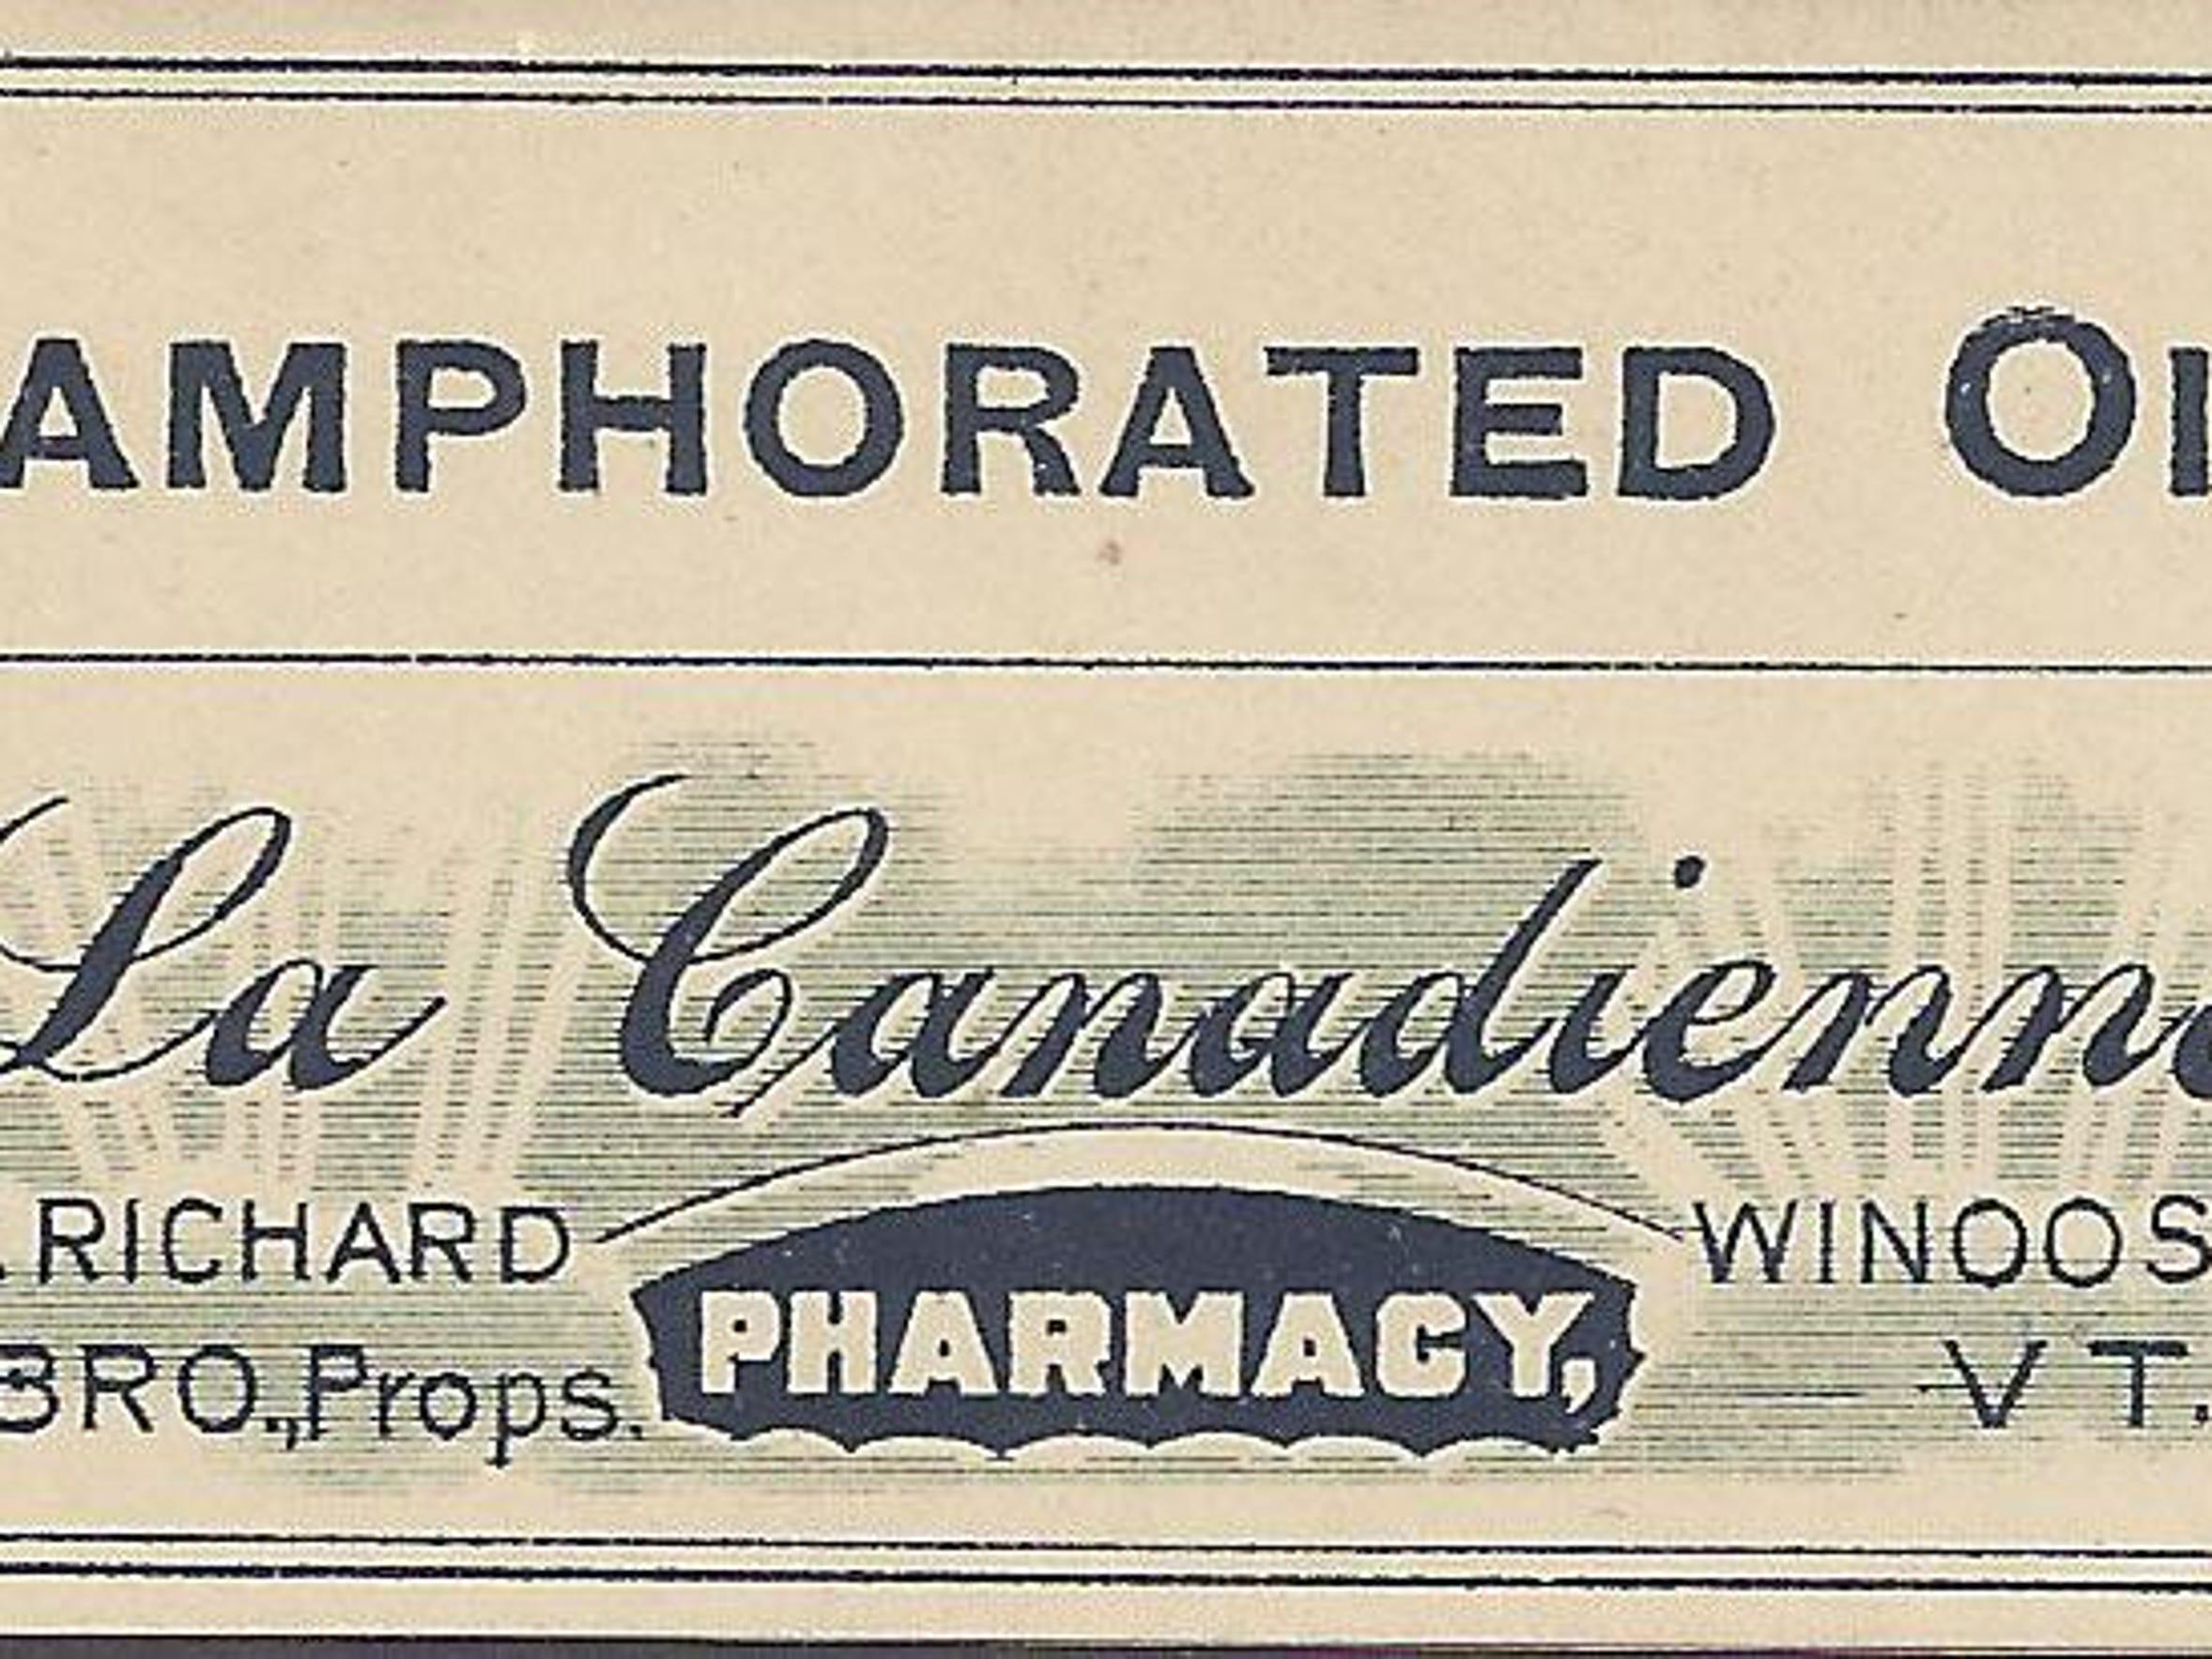 Bottle label from Oliva Richard's Pharmacy in the Winooski